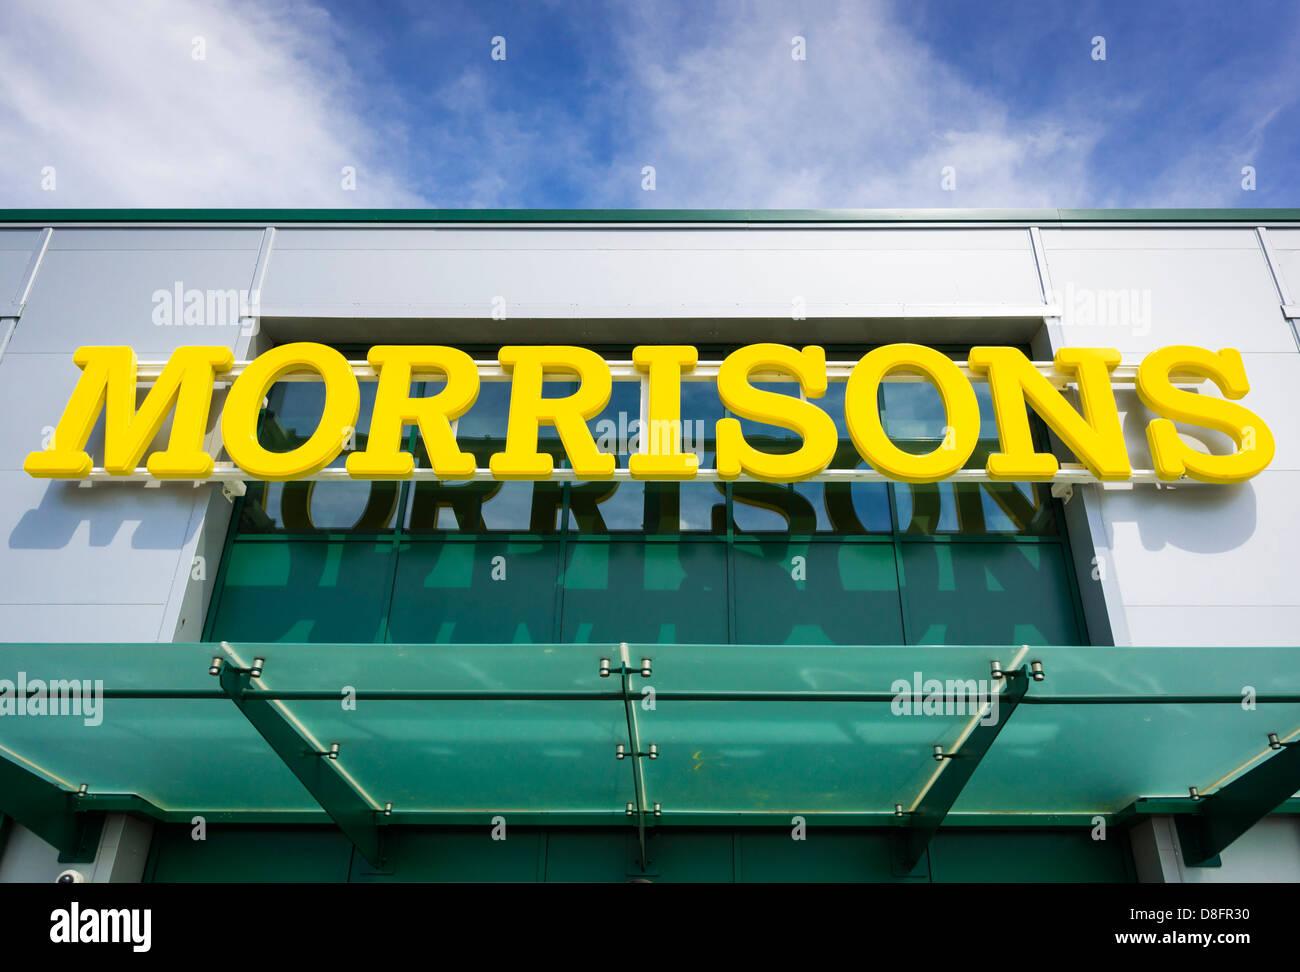 Morrisons supermarket sign / logo Stock Photo